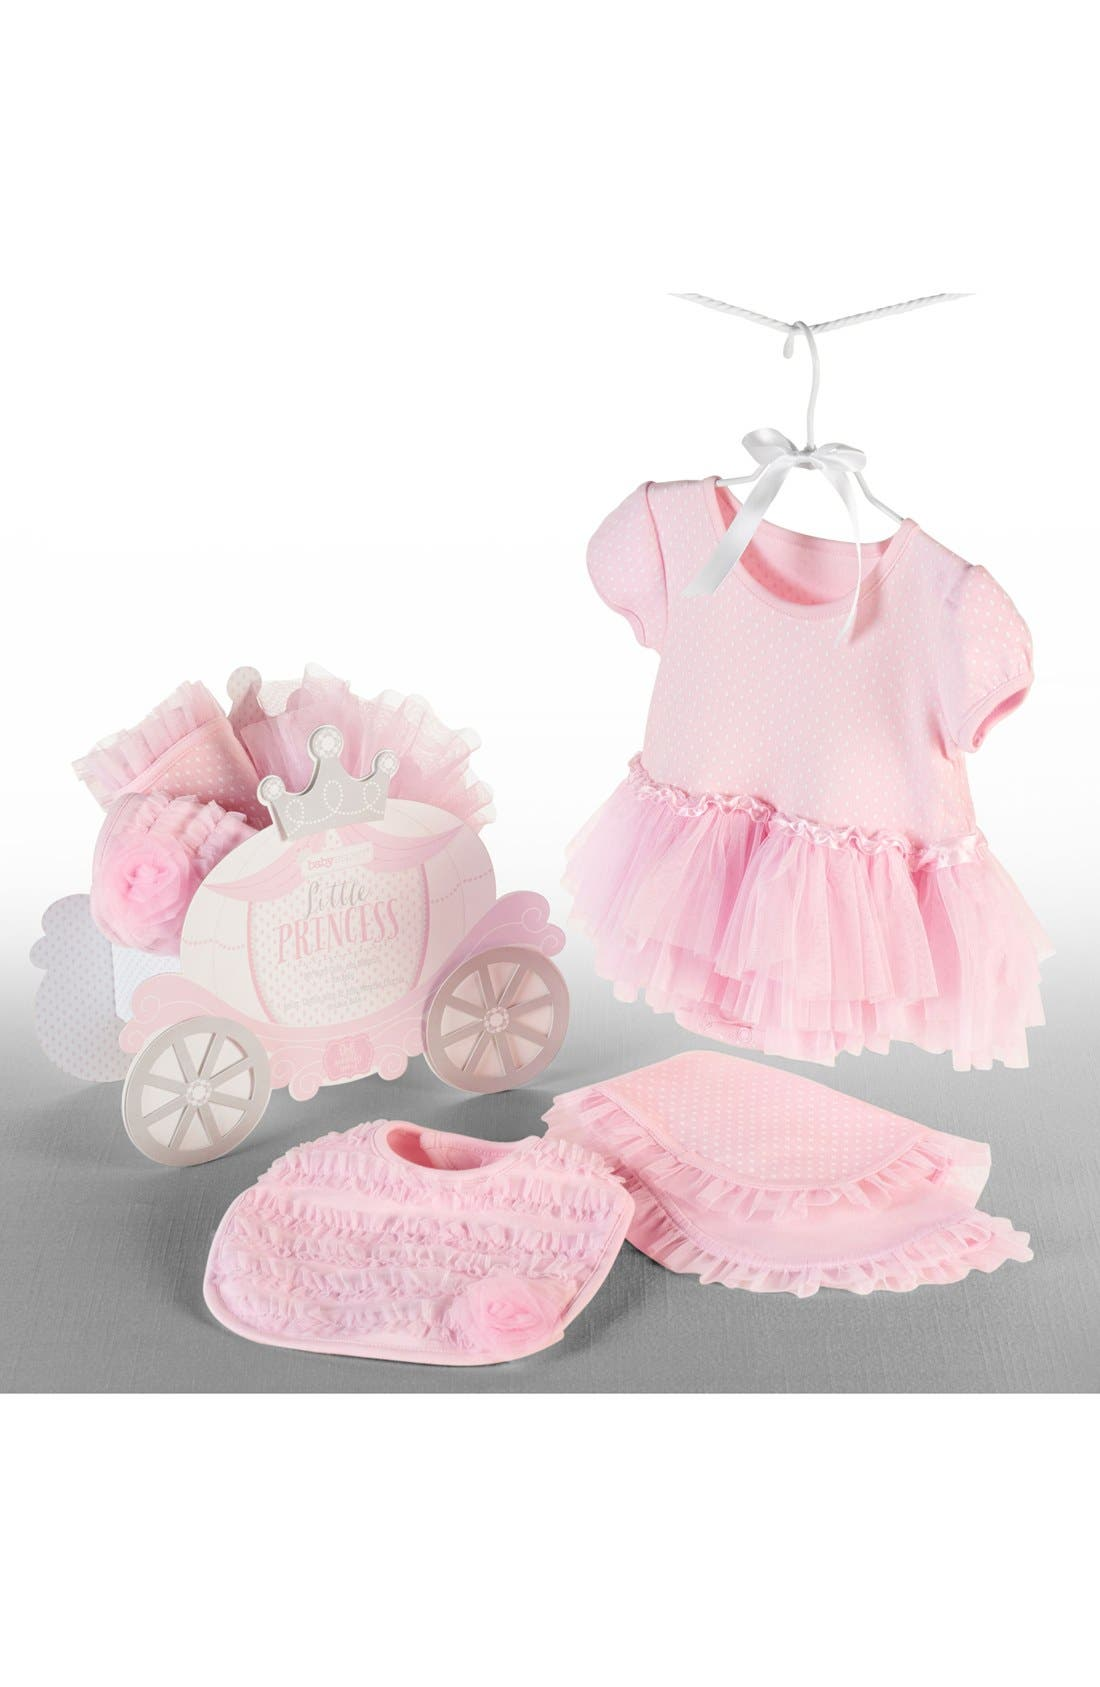 Little Princess 3-Piece Gift Set,                             Main thumbnail 1, color,                             Pink